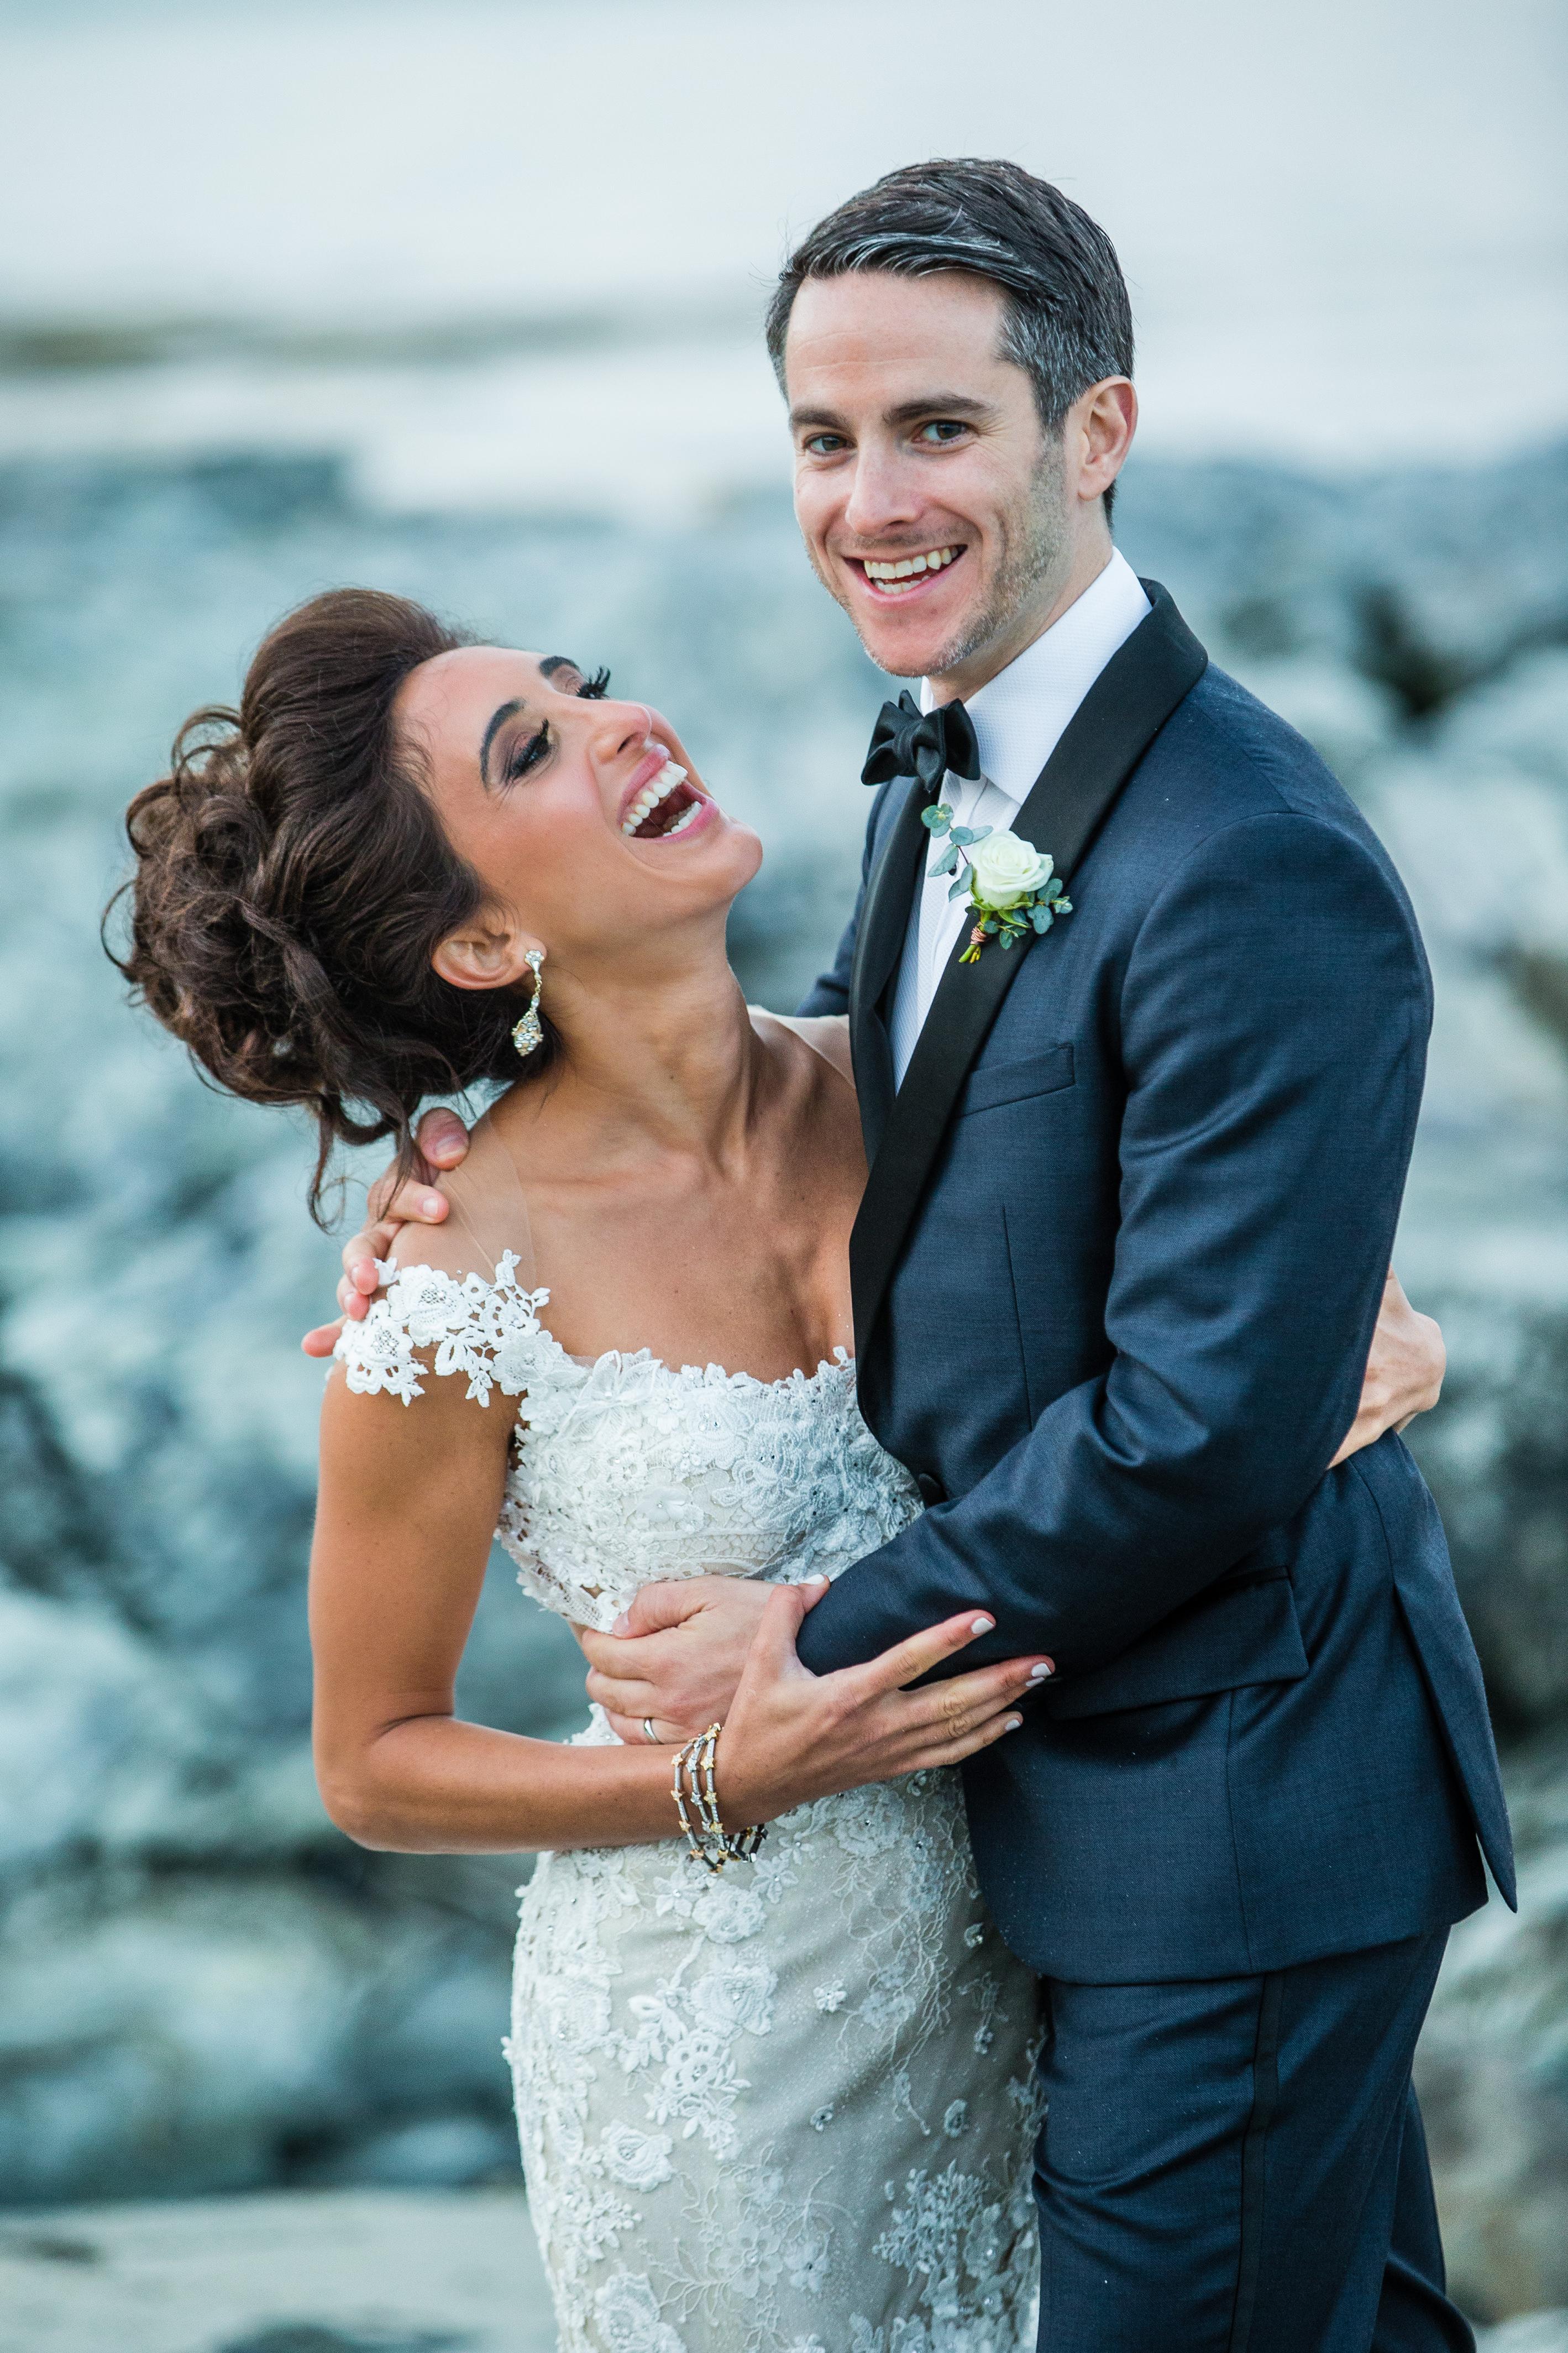 House Island wedding of Christi & Zak